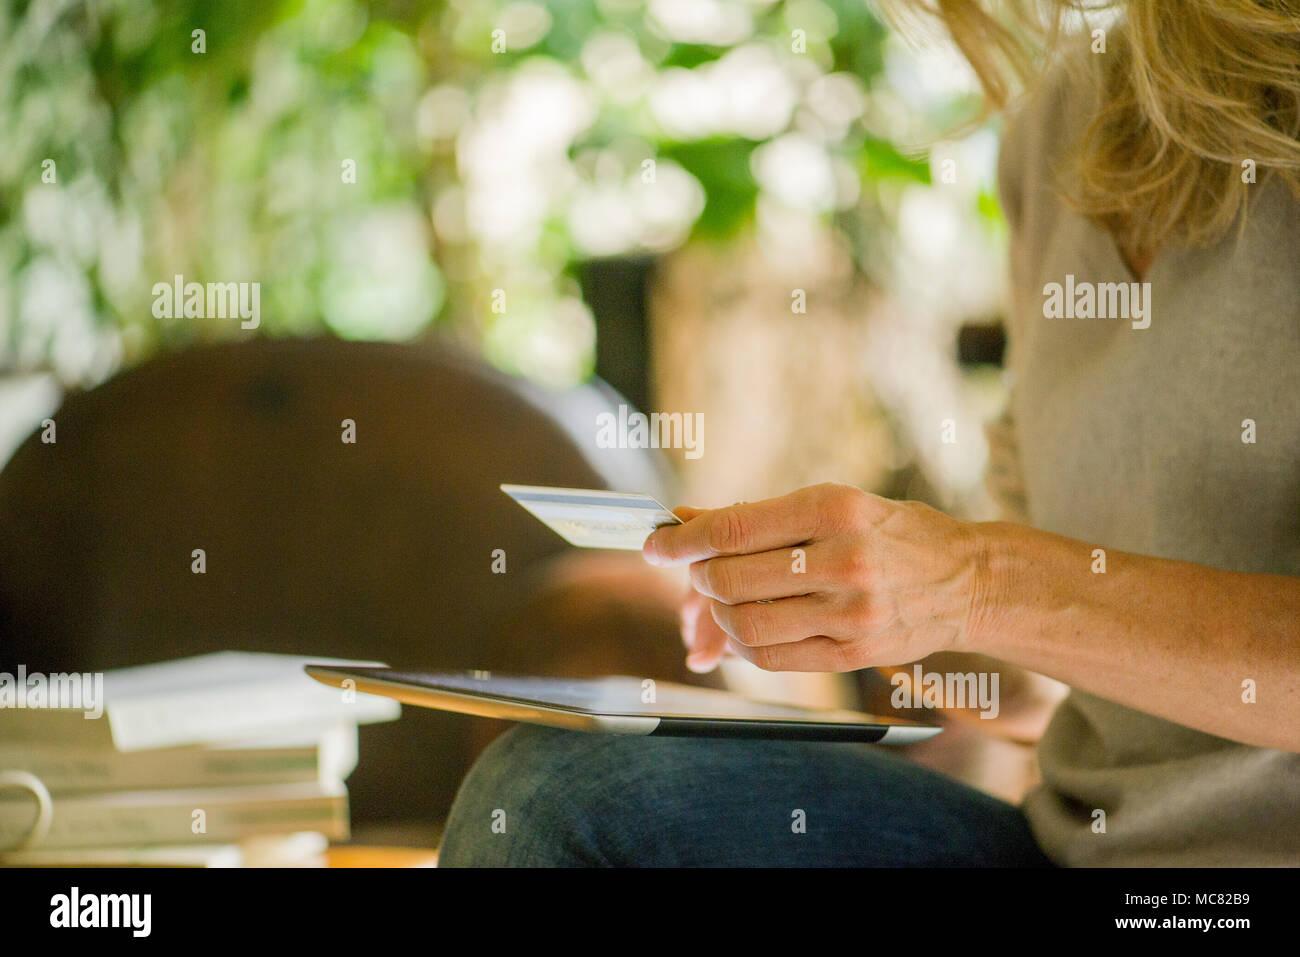 Frau mit digitalen Tablet und Kreditkarte, 7/8 Stockbild